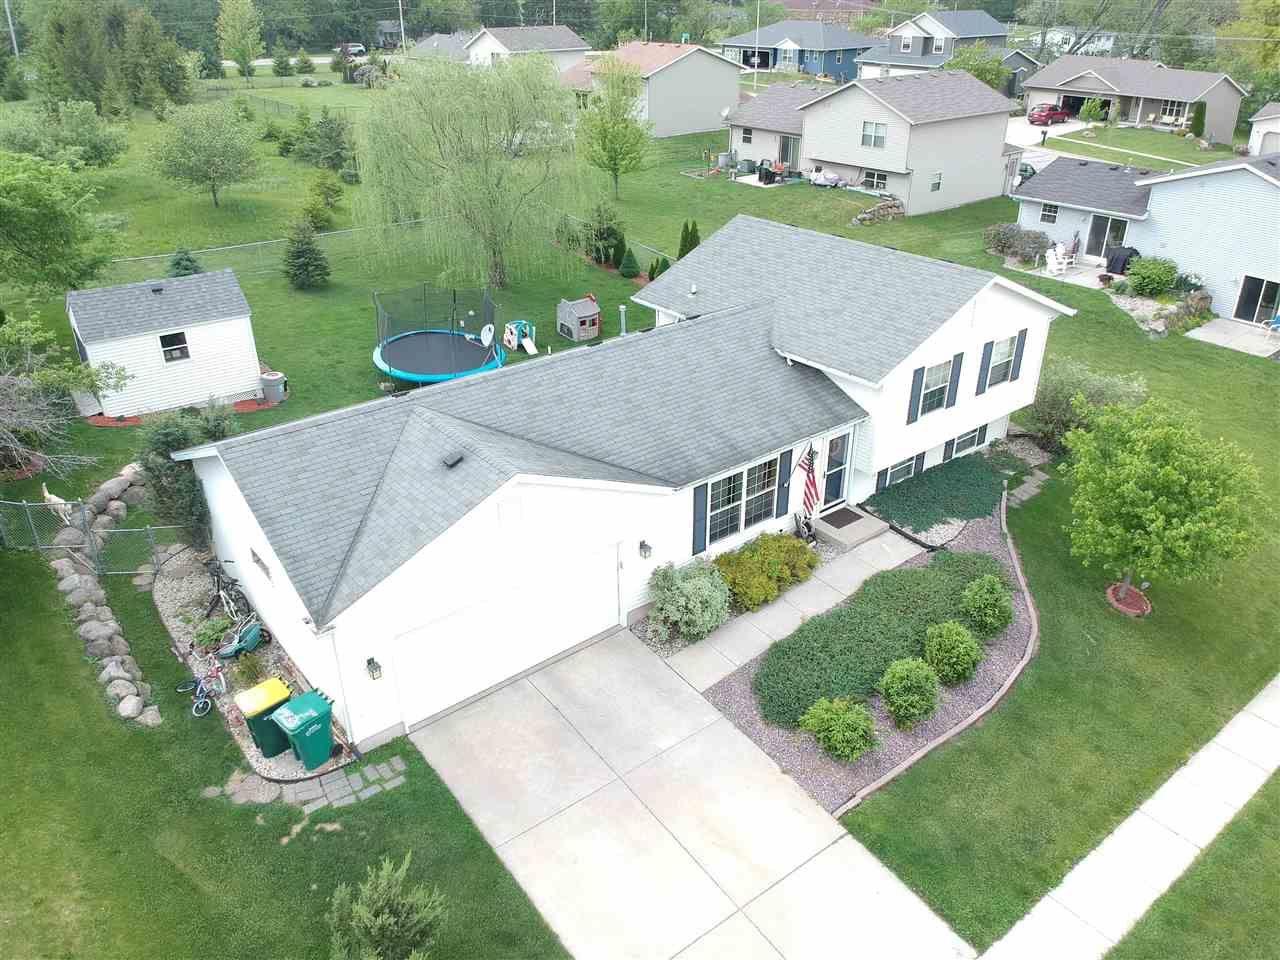 f_1909942 Real Estate in 53534 zip code